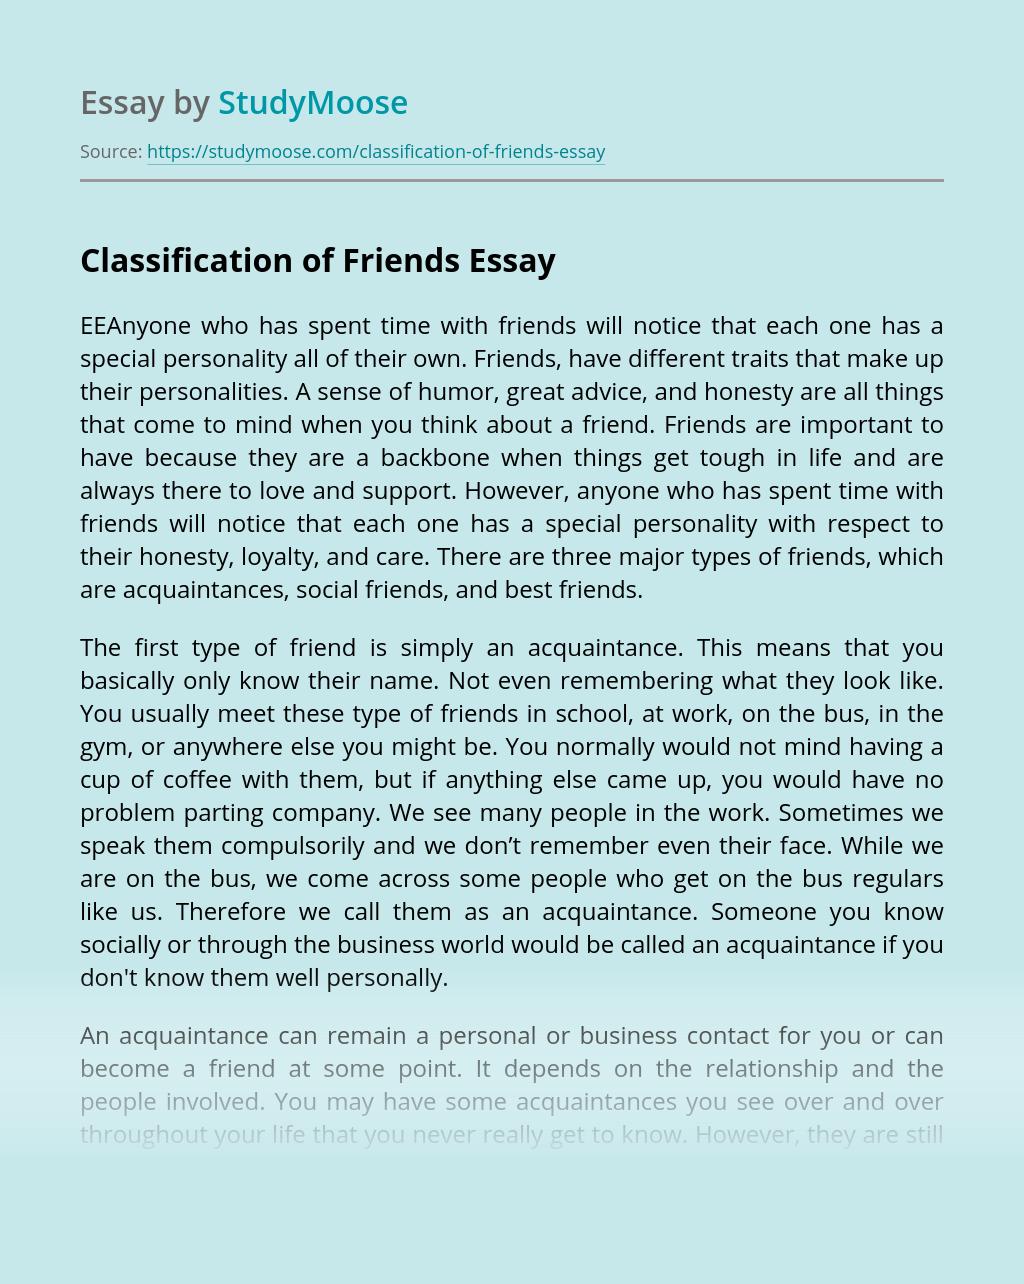 Classification of Friends